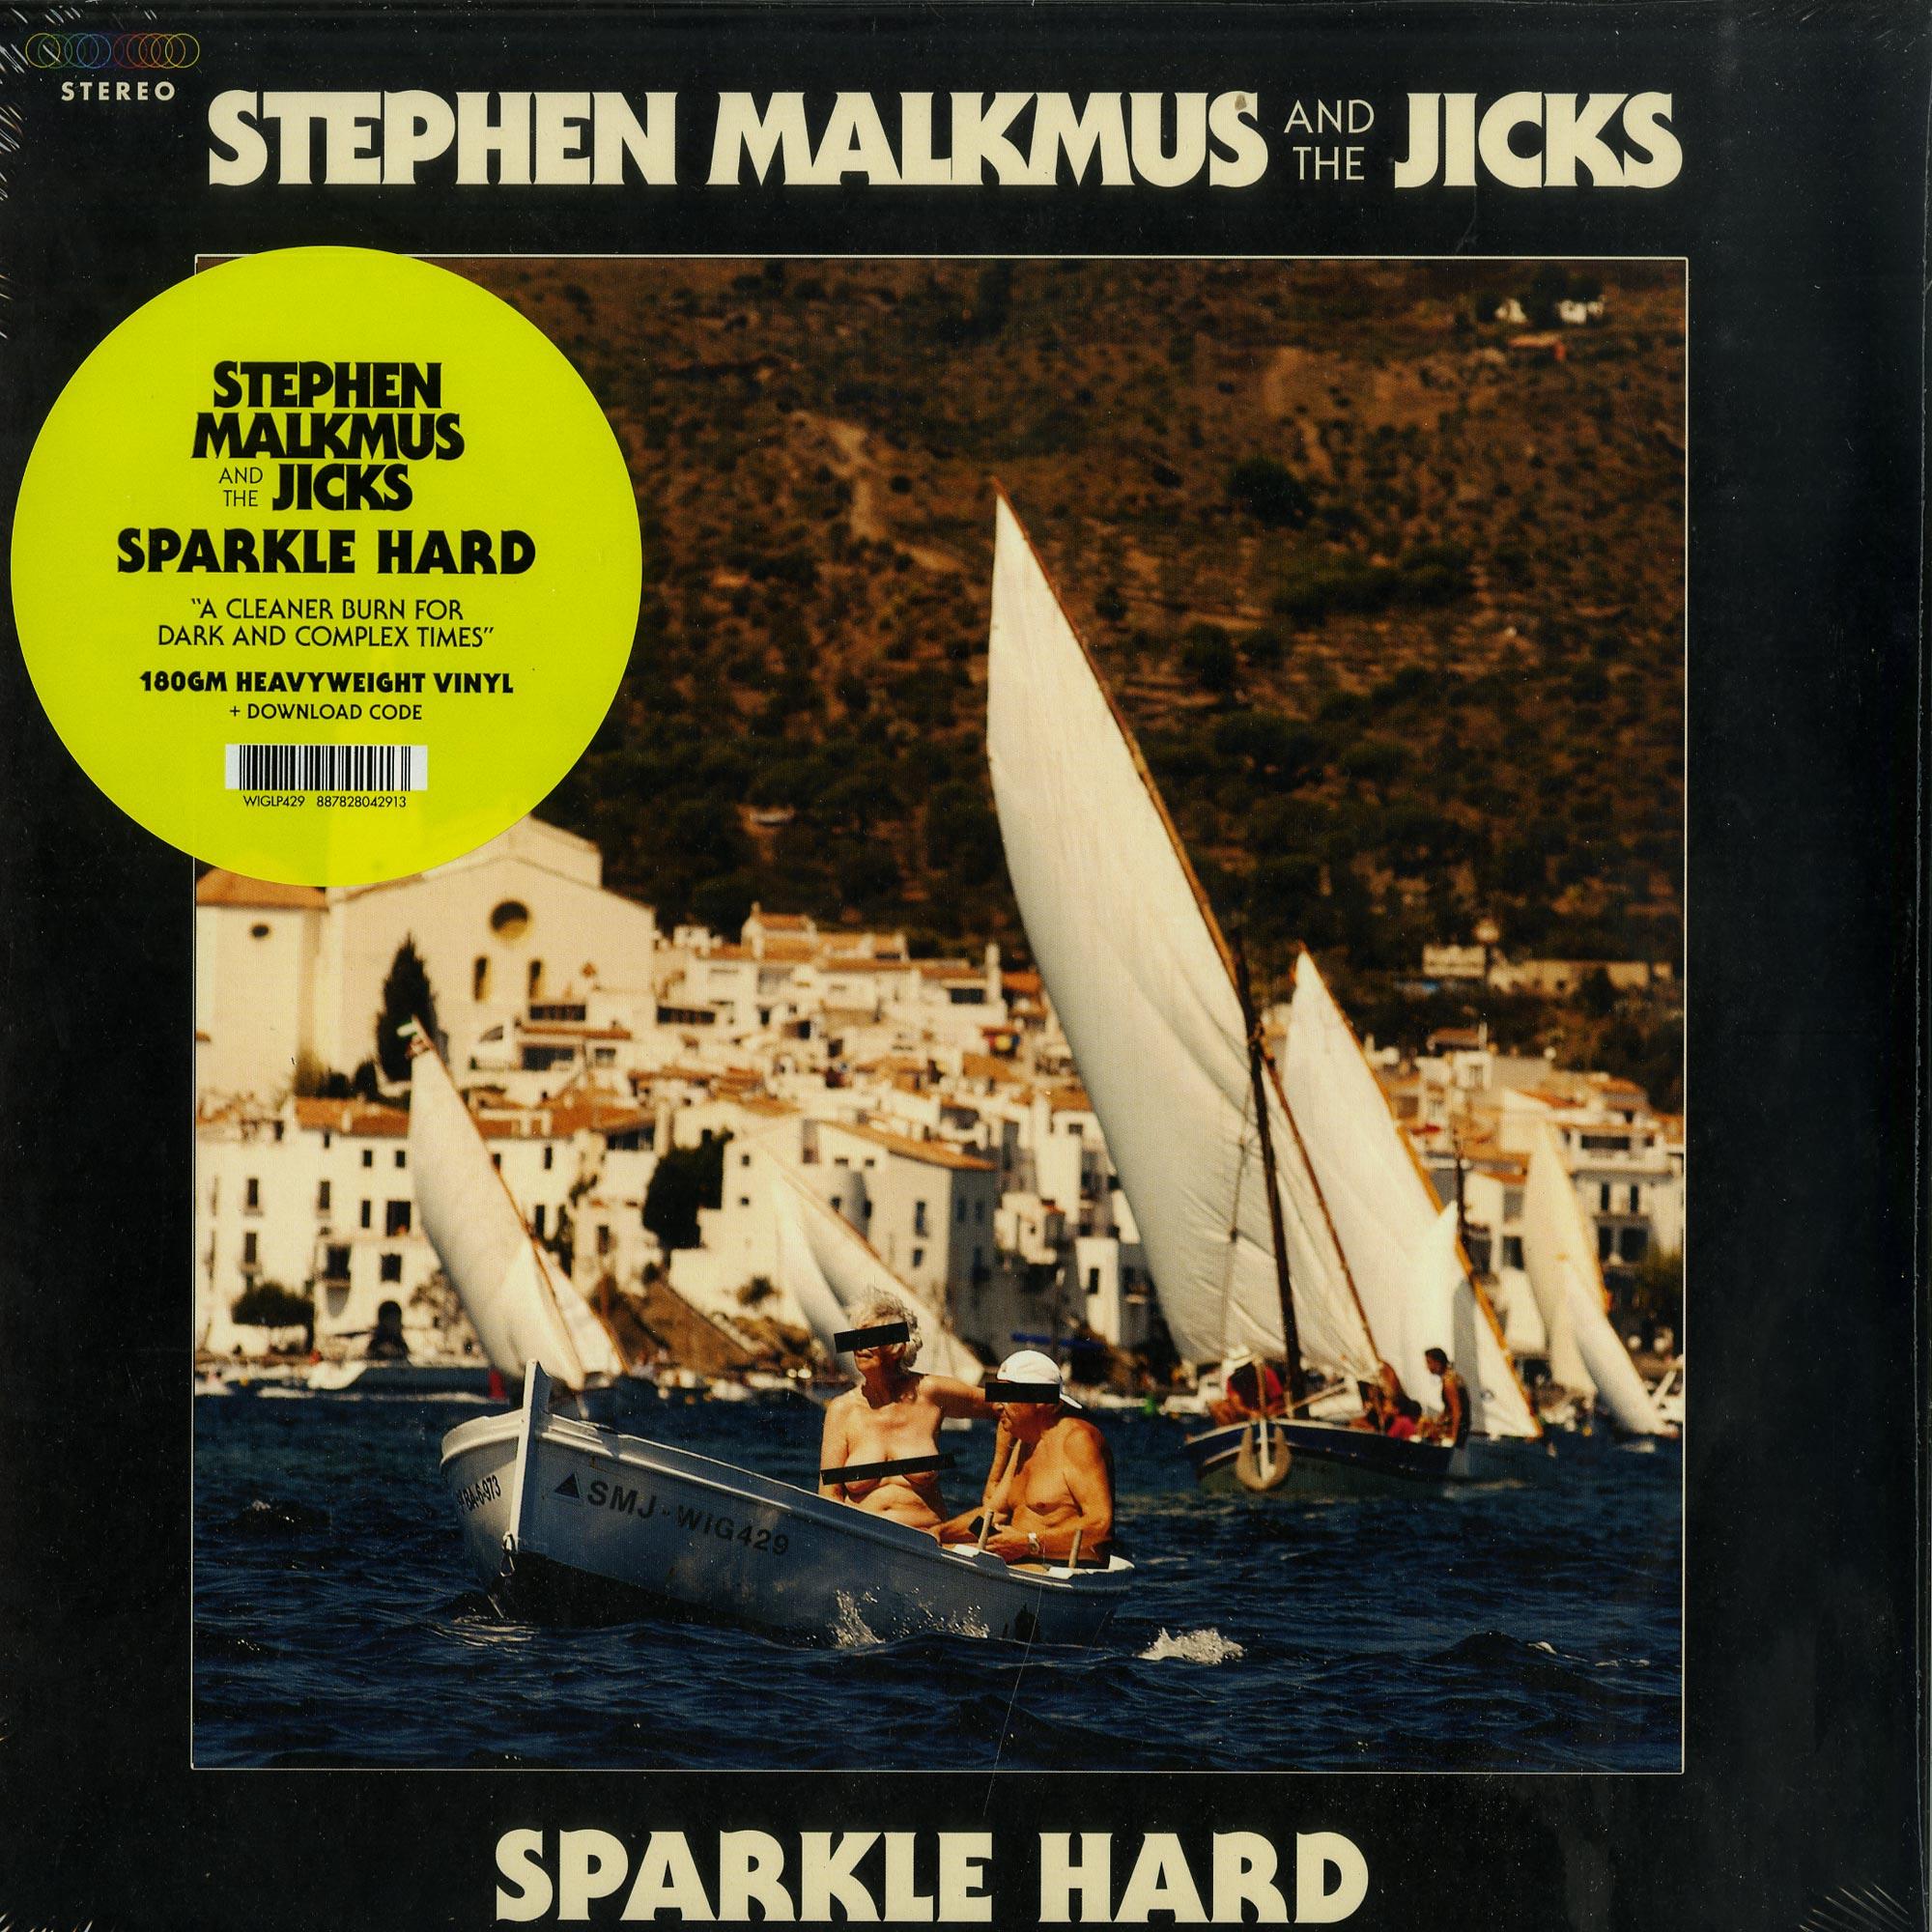 Stephen Malkmus & The Jicks - SPARKLE HARD